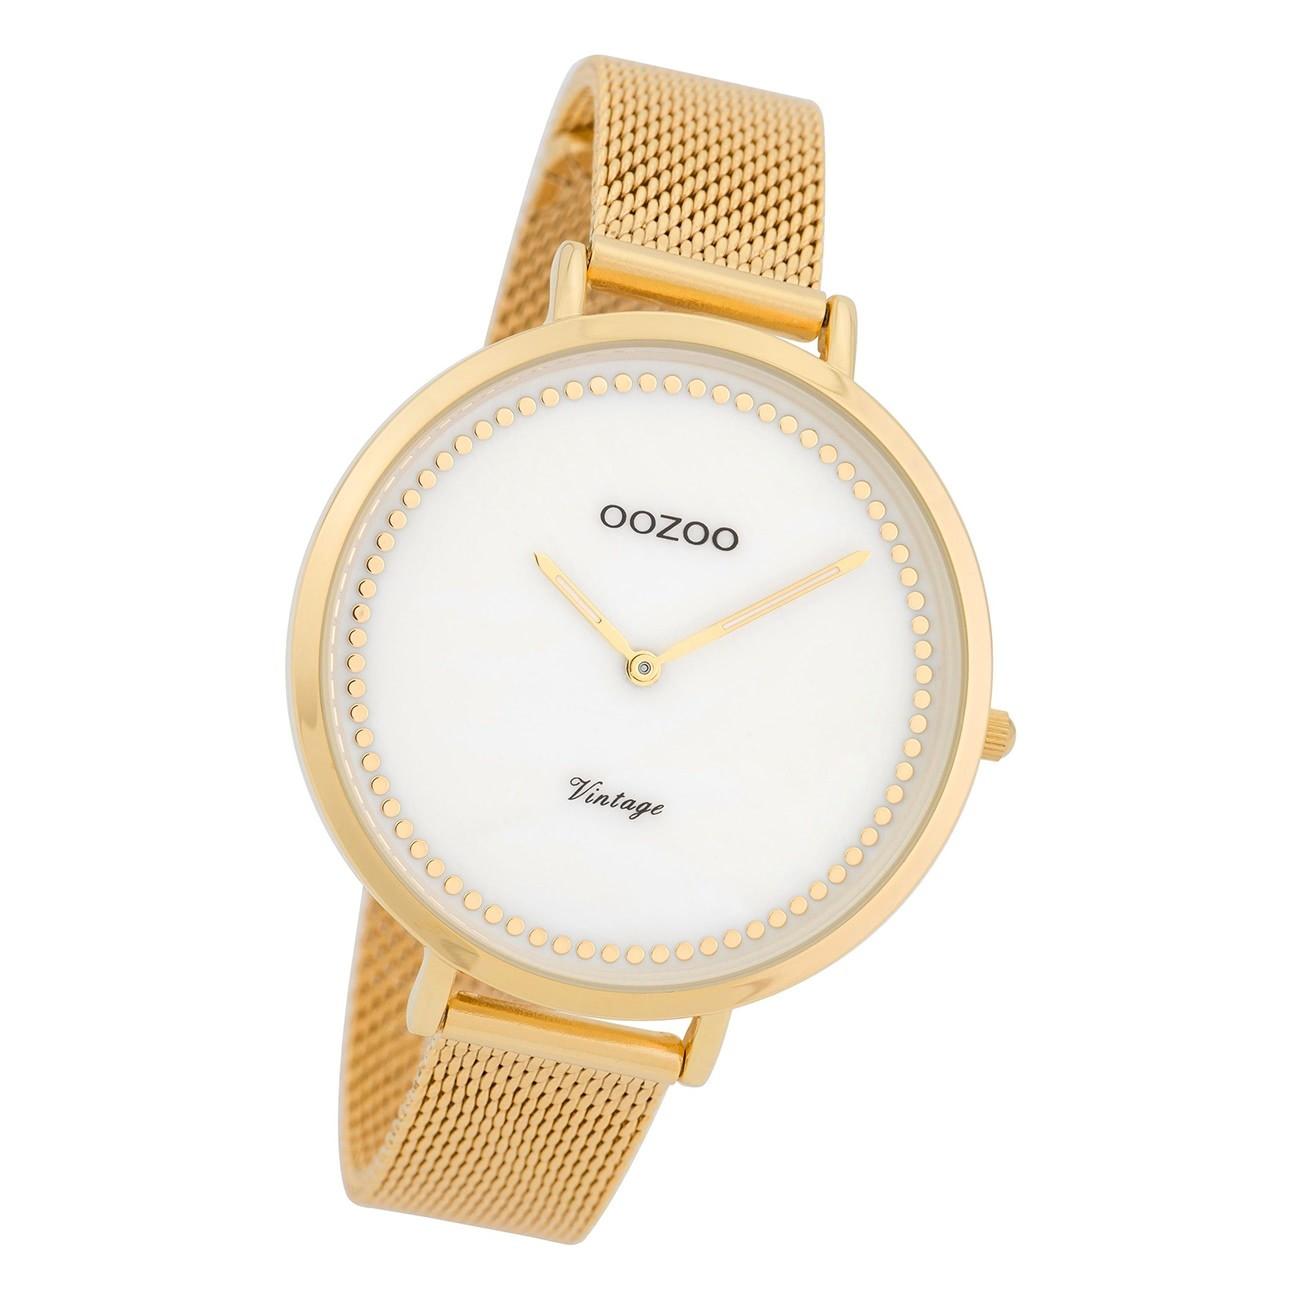 Oozoo Damen Armbanduhr Ultra Slim C9857 Analog Edelstahl gold UOC9857